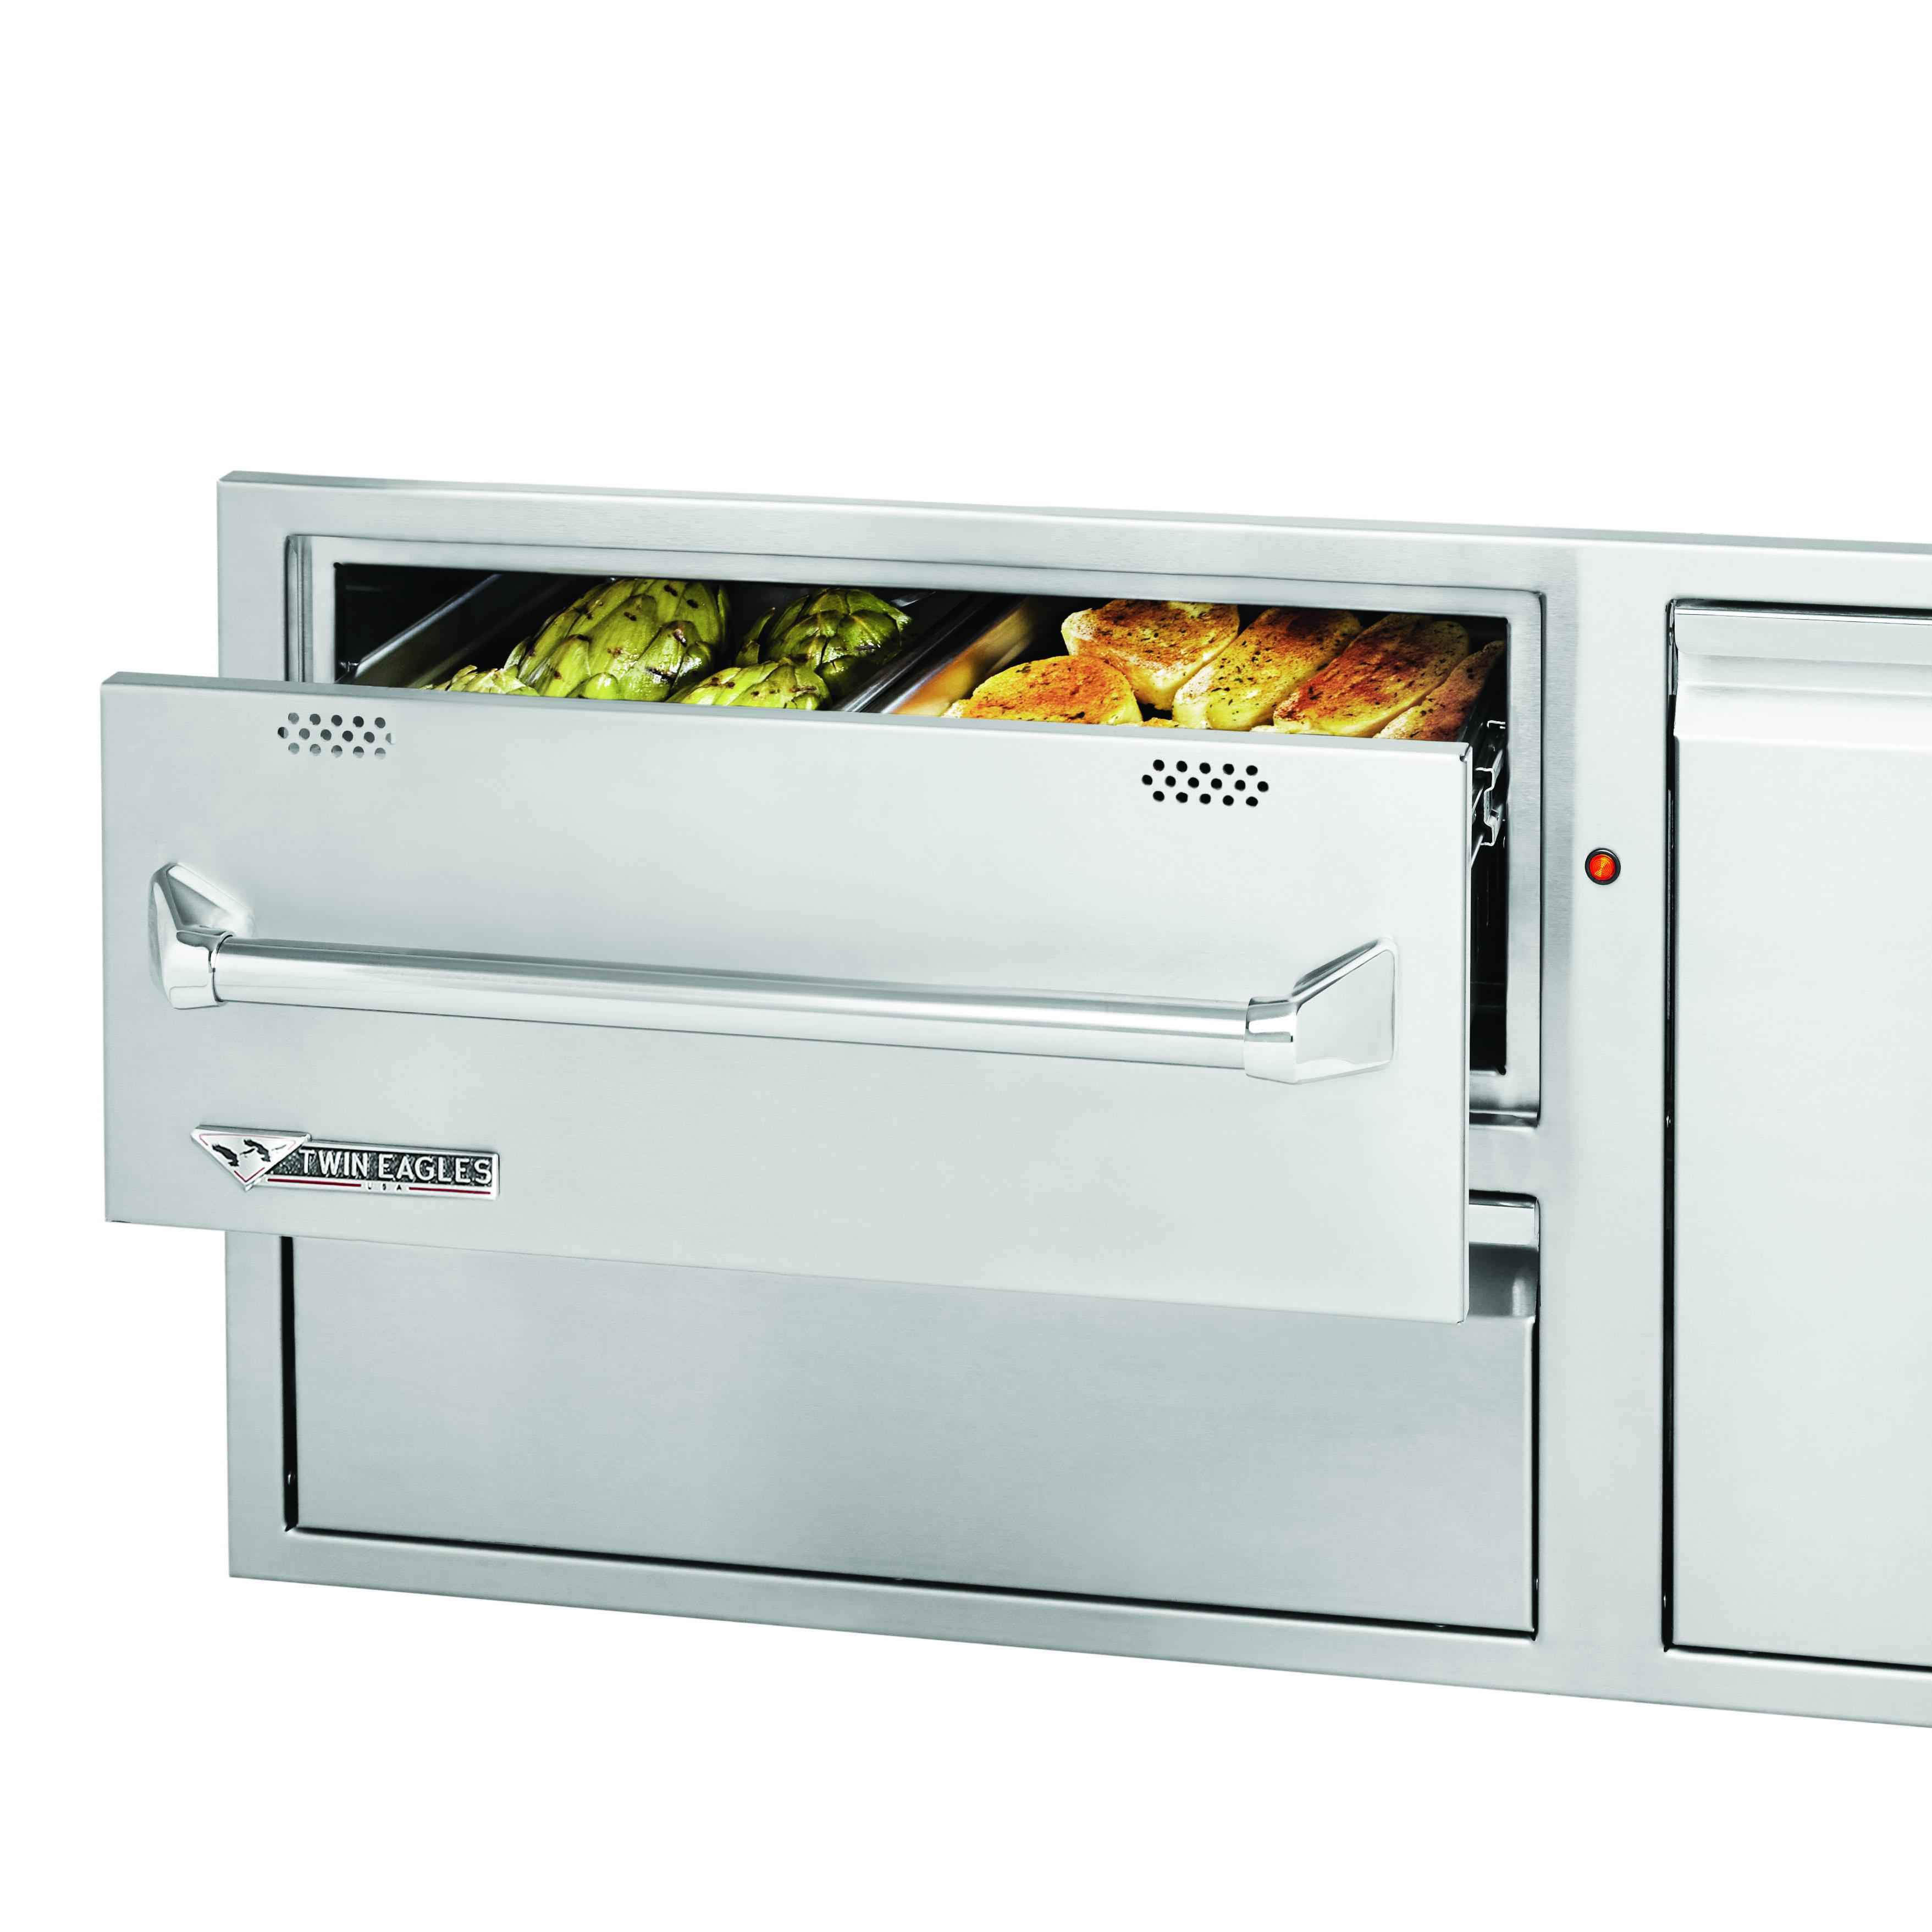 Oven Food Warmer Drawer ~ Warming drawer wildwood ovens